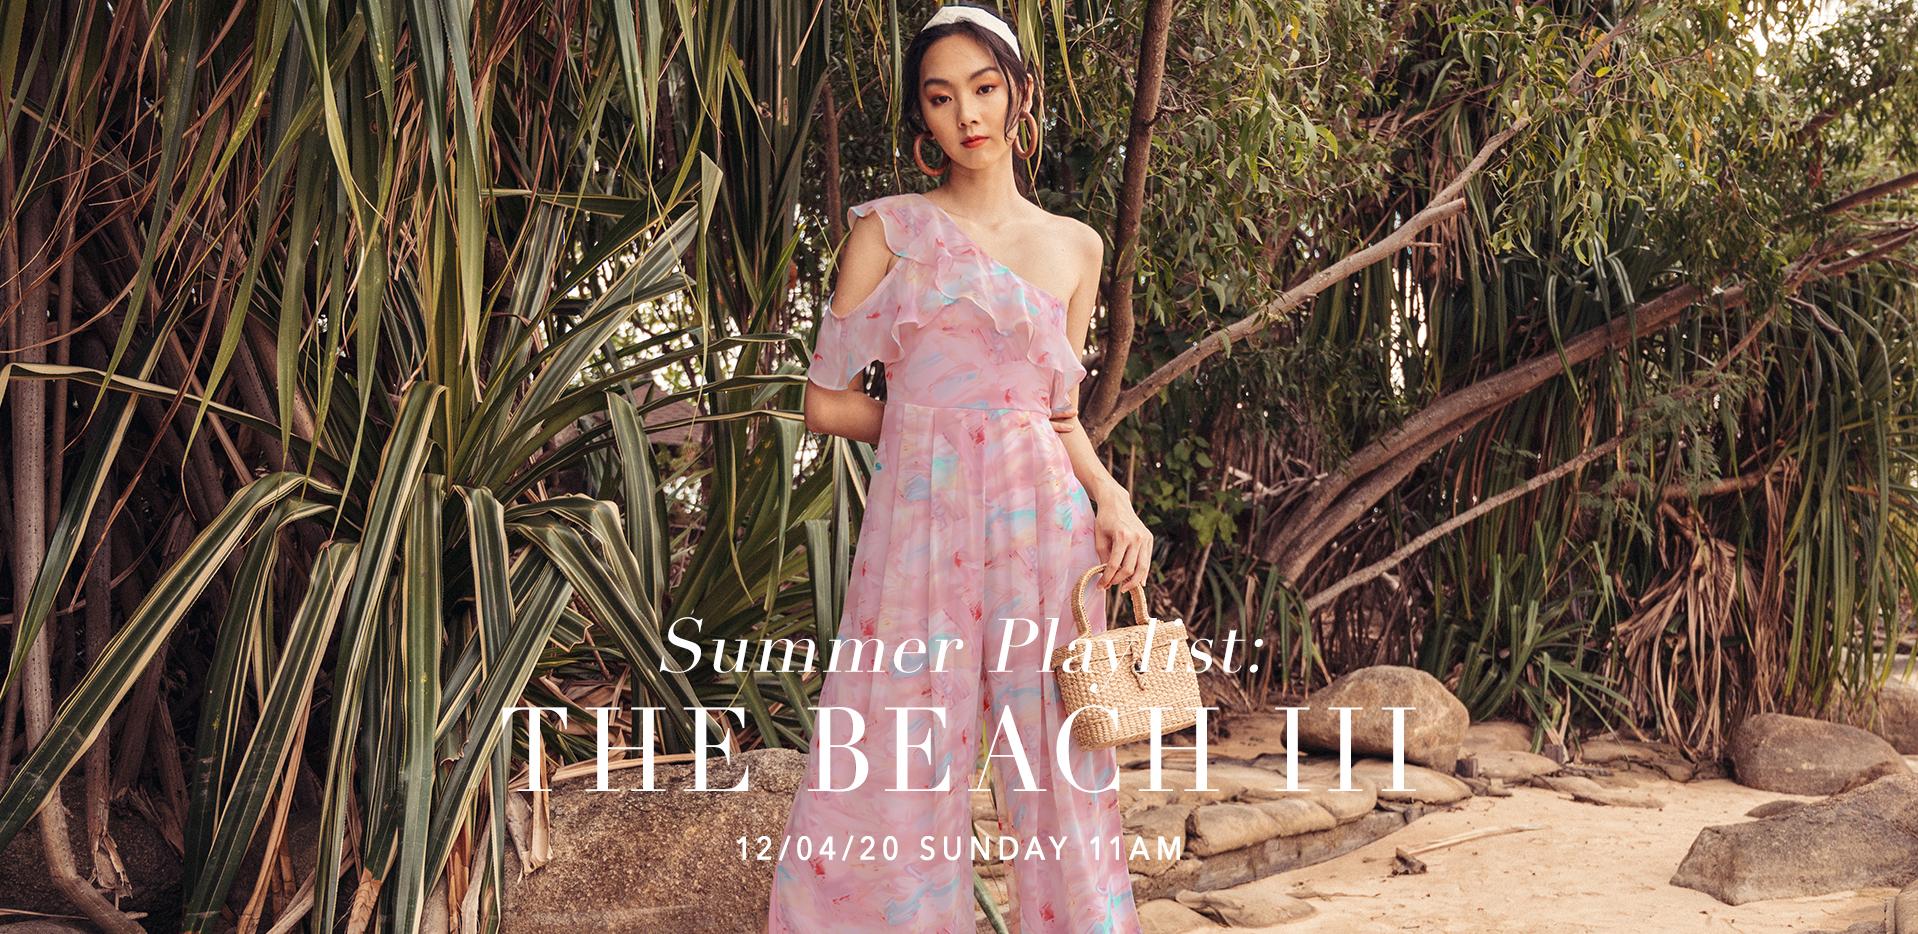 SUMMER PLAYLIST: THE BEACH III